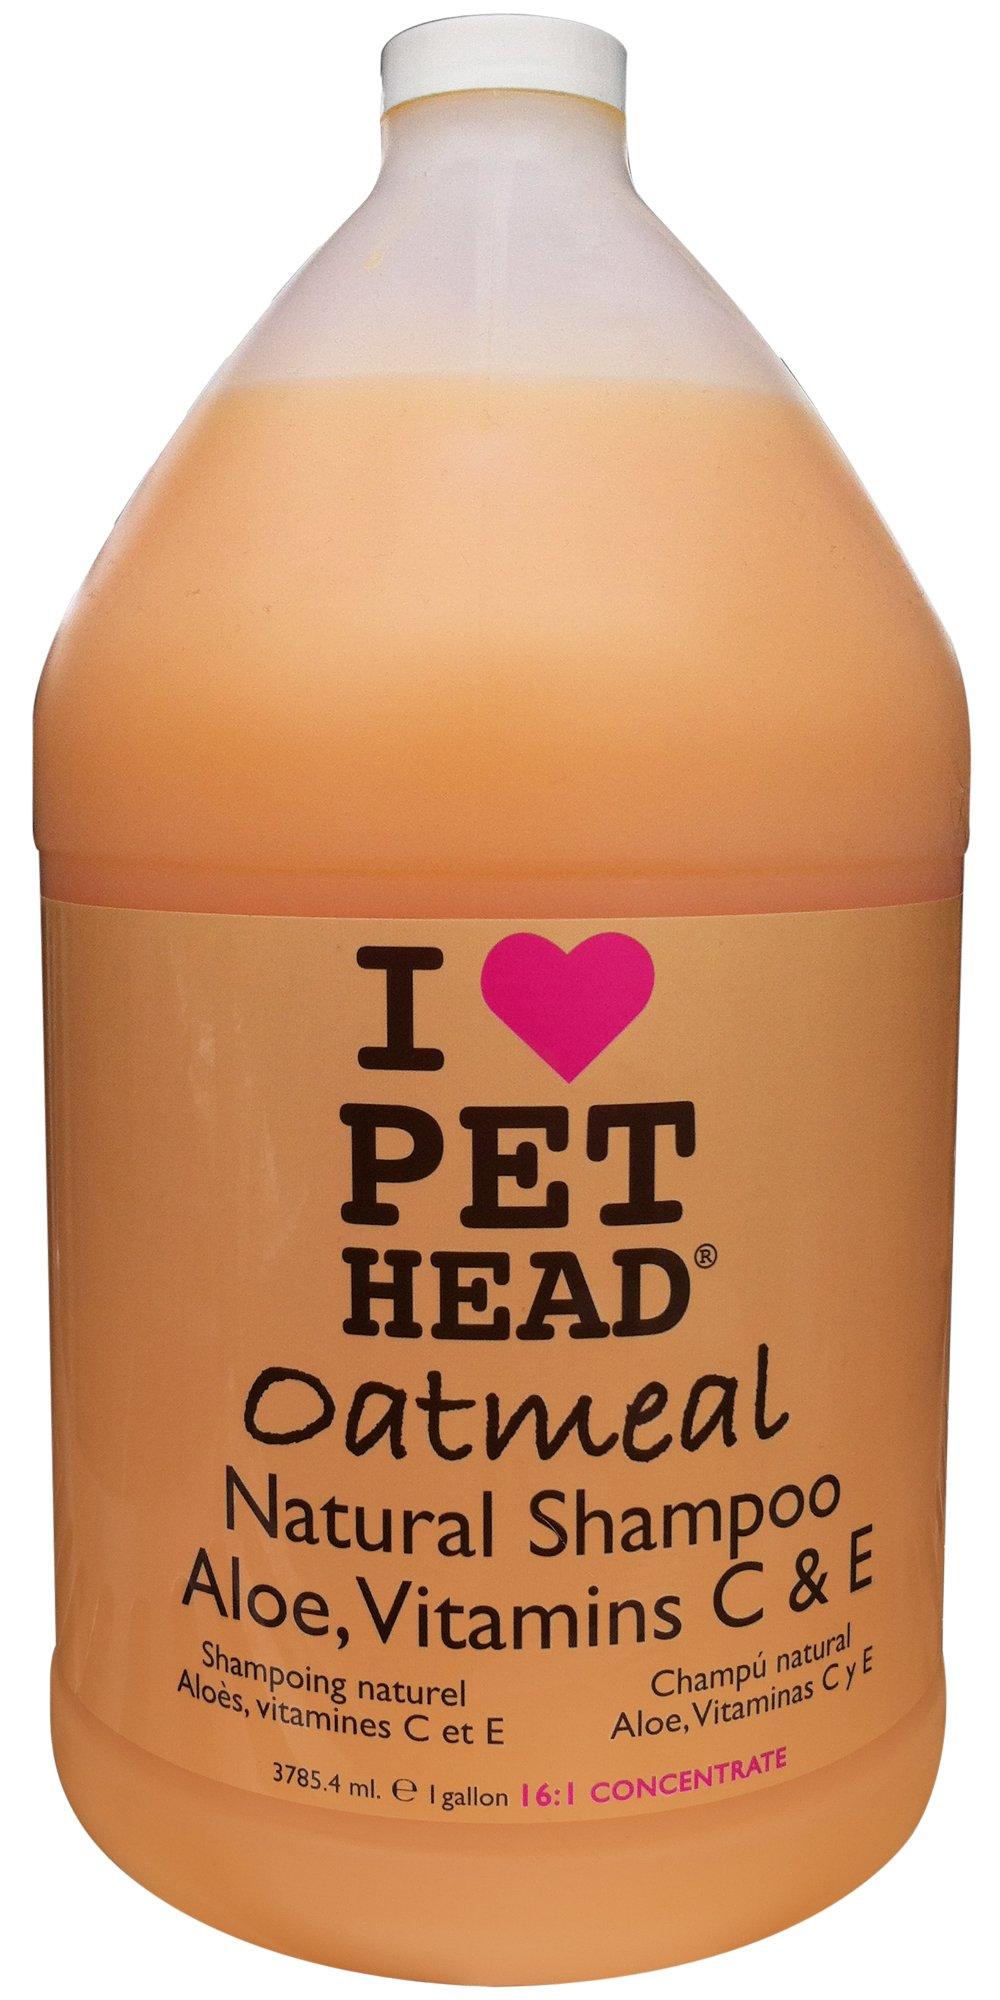 The Company of Animals Pet Head Oatmeal Natural Shampoo (1 Gallon)